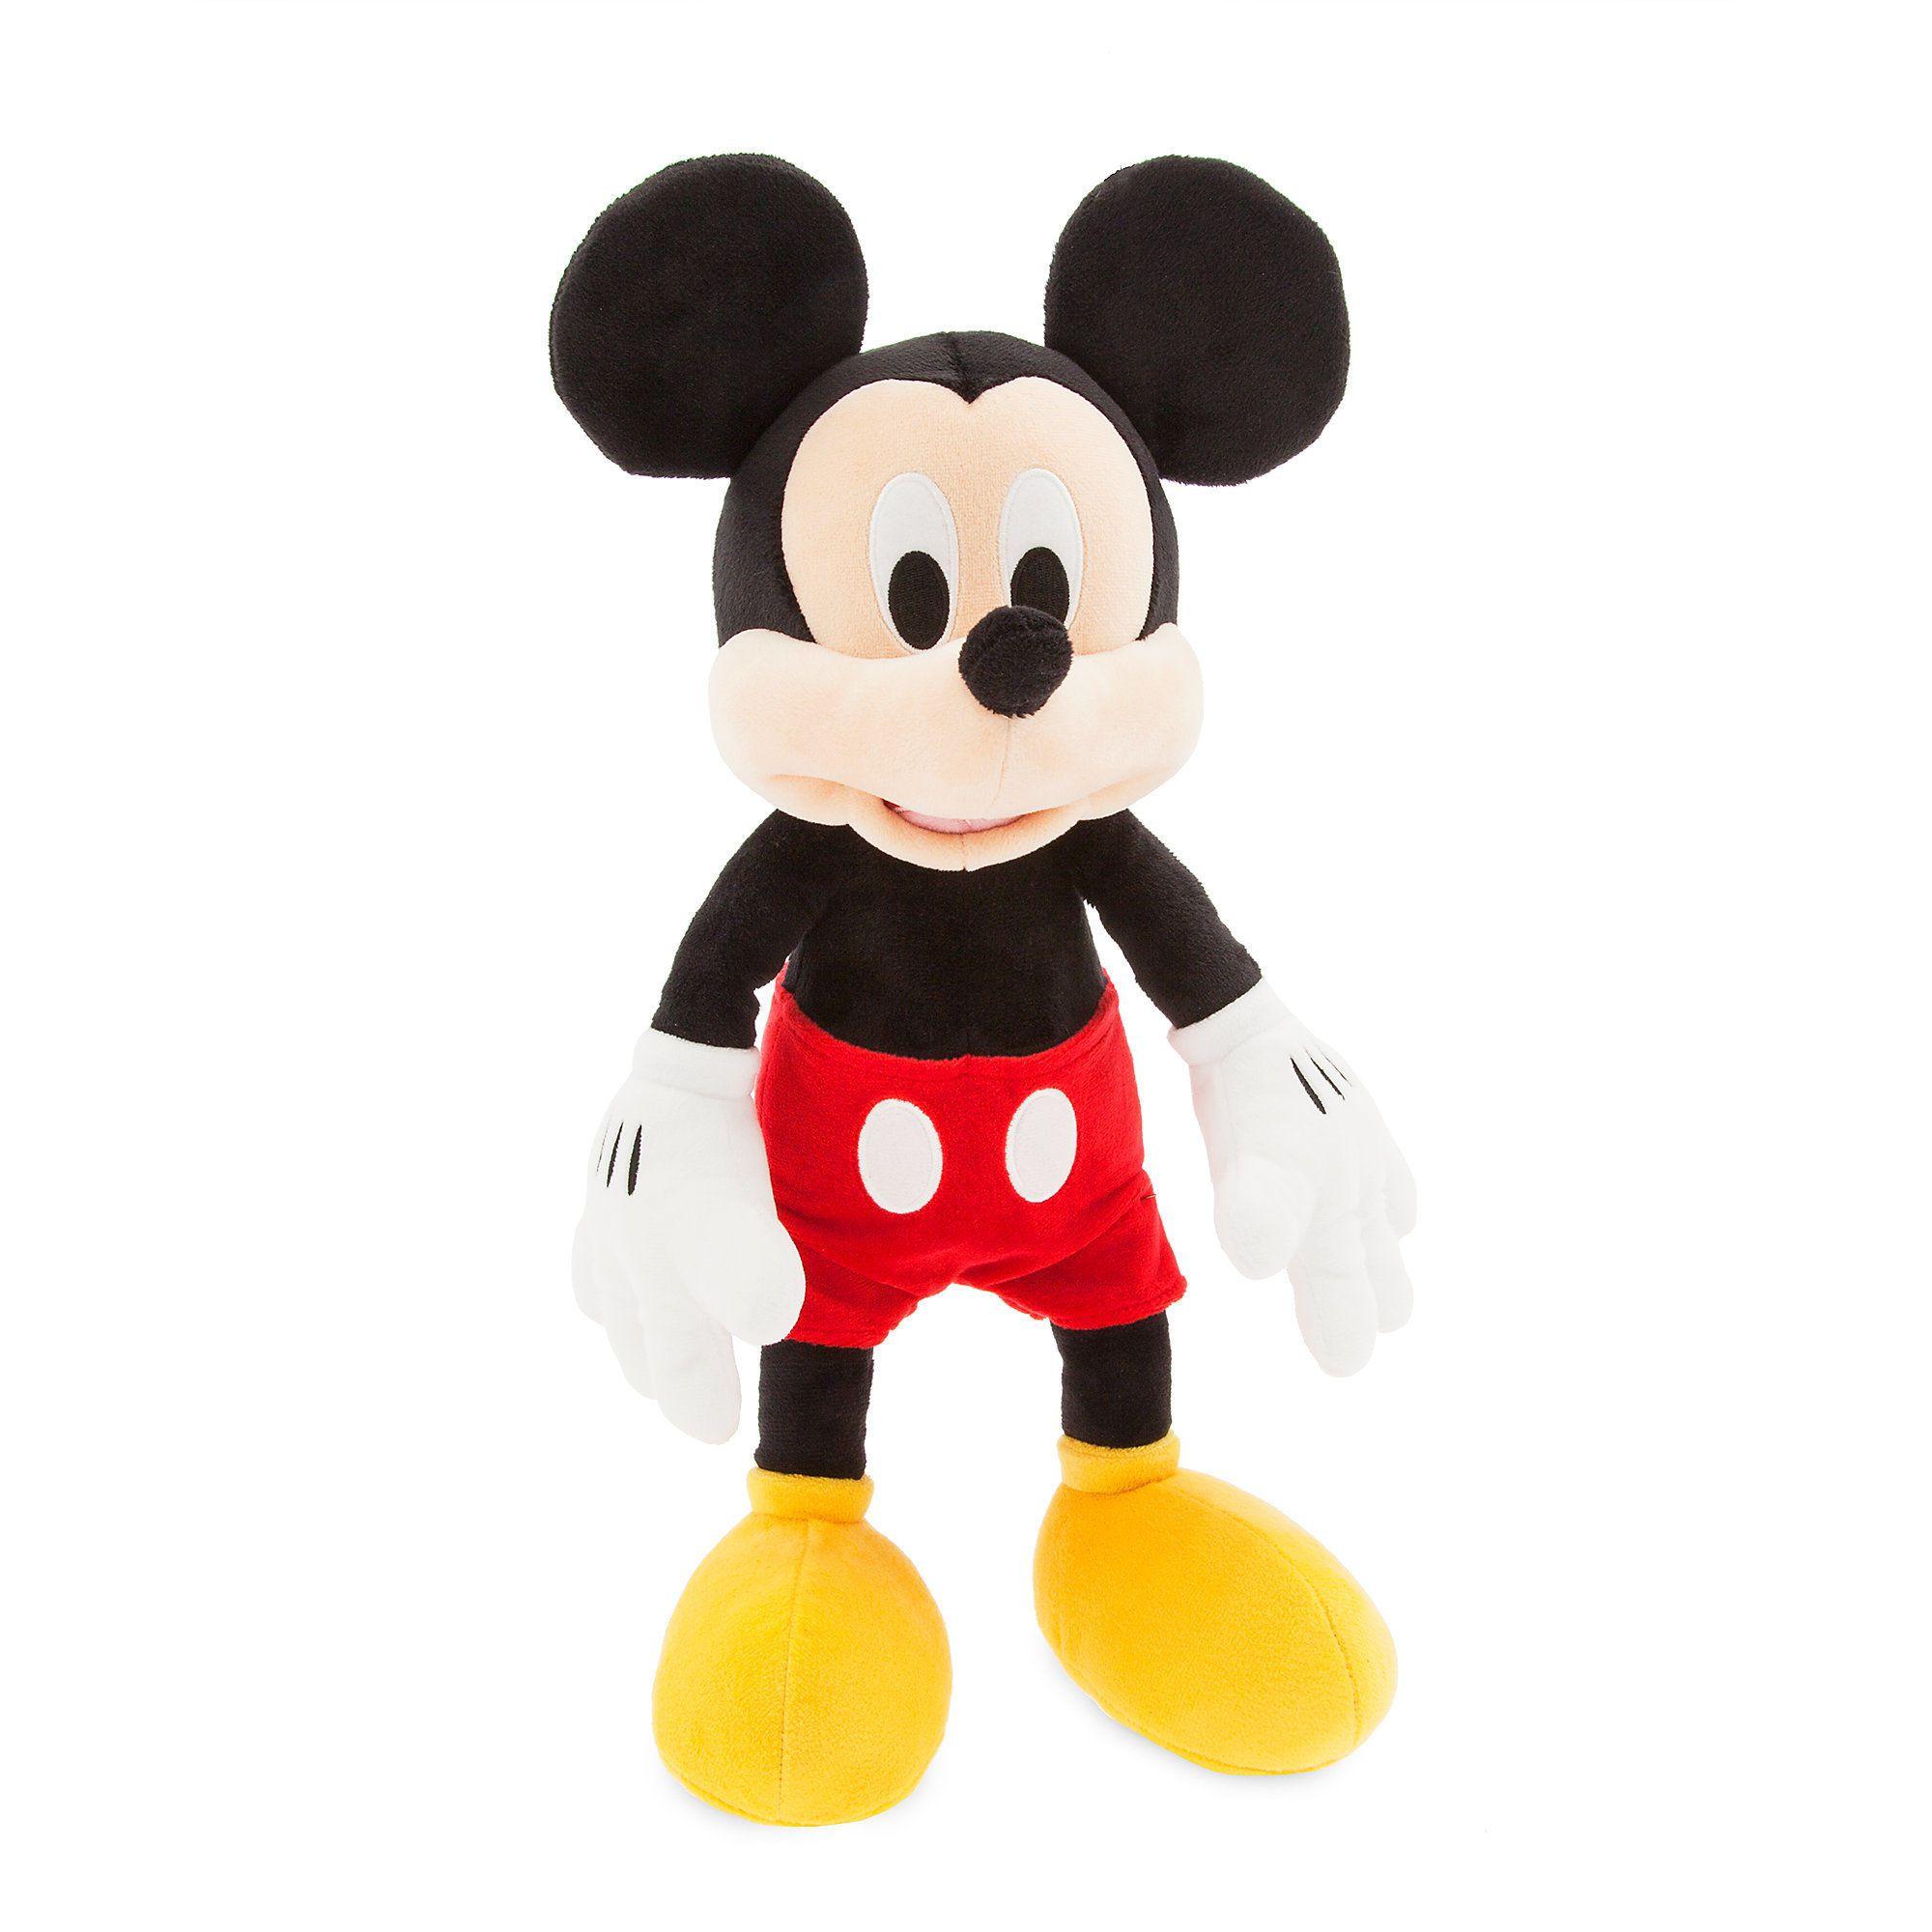 Mickey Mouse Pelúcia - Original Disney Store